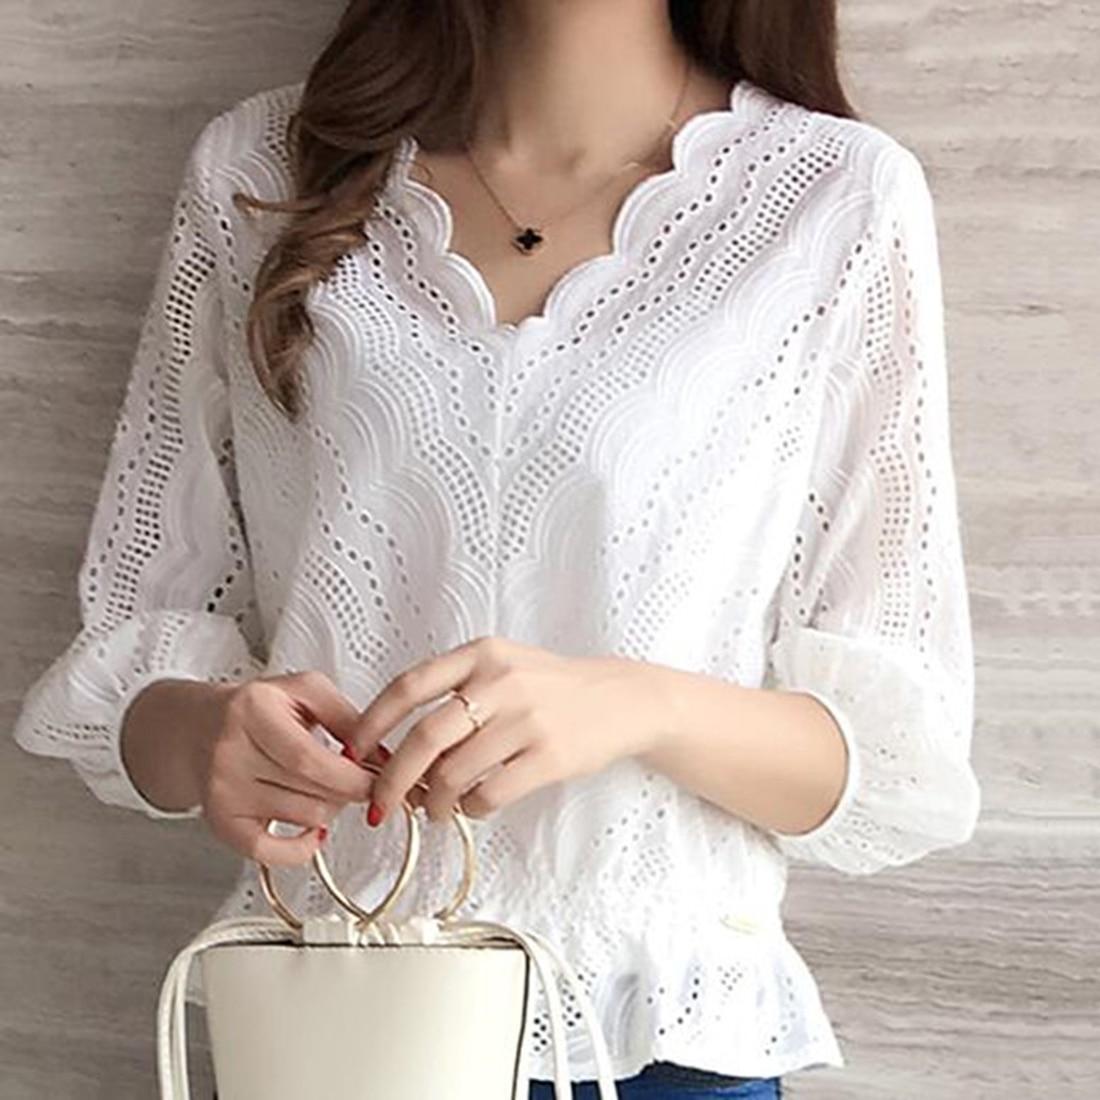 New cotton Eyelet Embroidered Panel Blouse 2018 White Collar V neck three quarter Sleeve ...